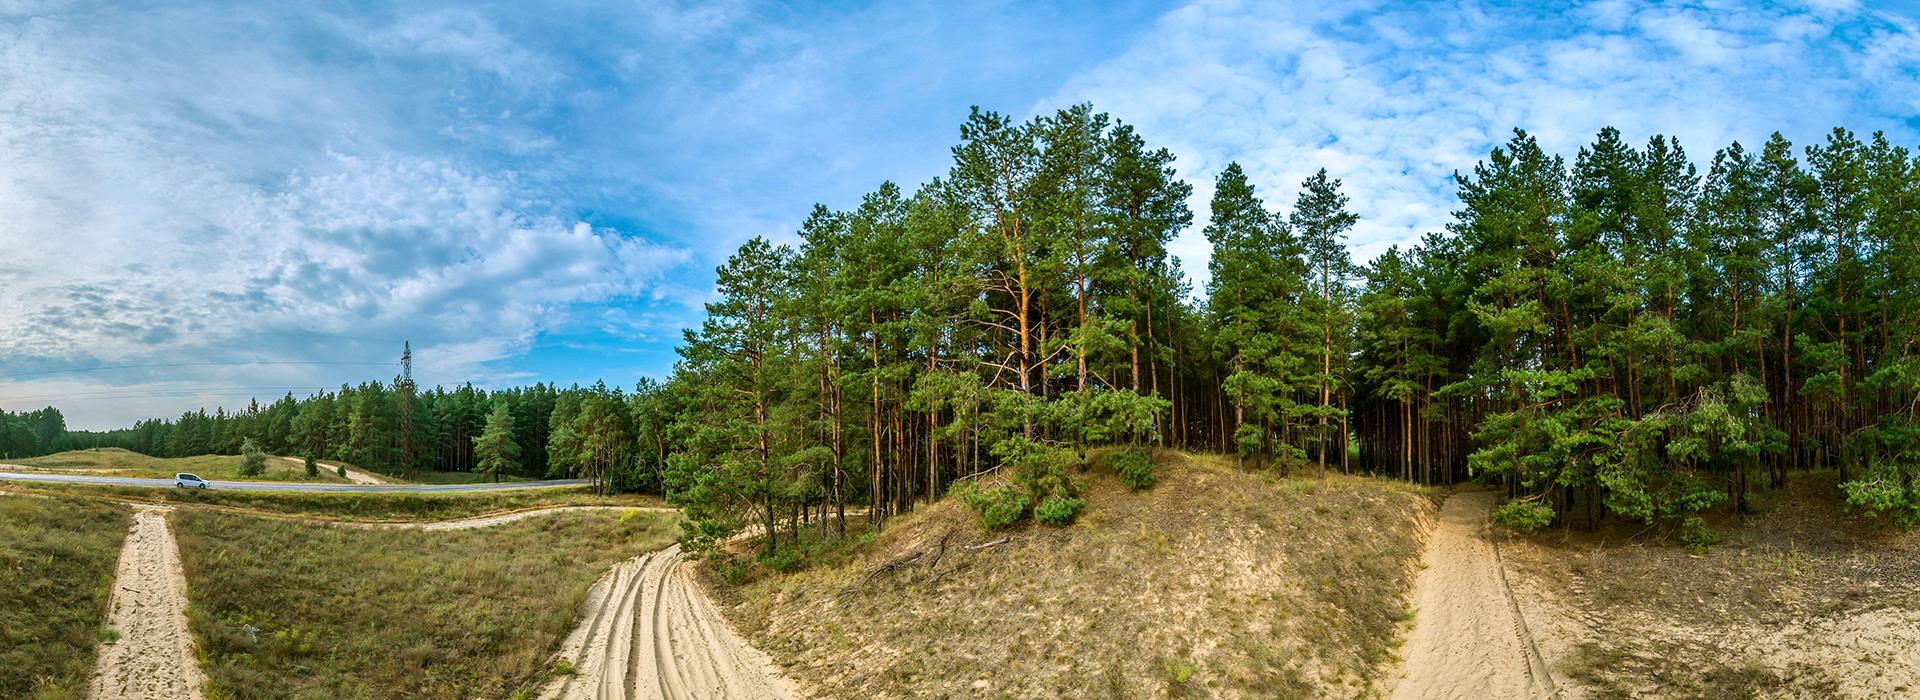 Страна лесов — Гилея